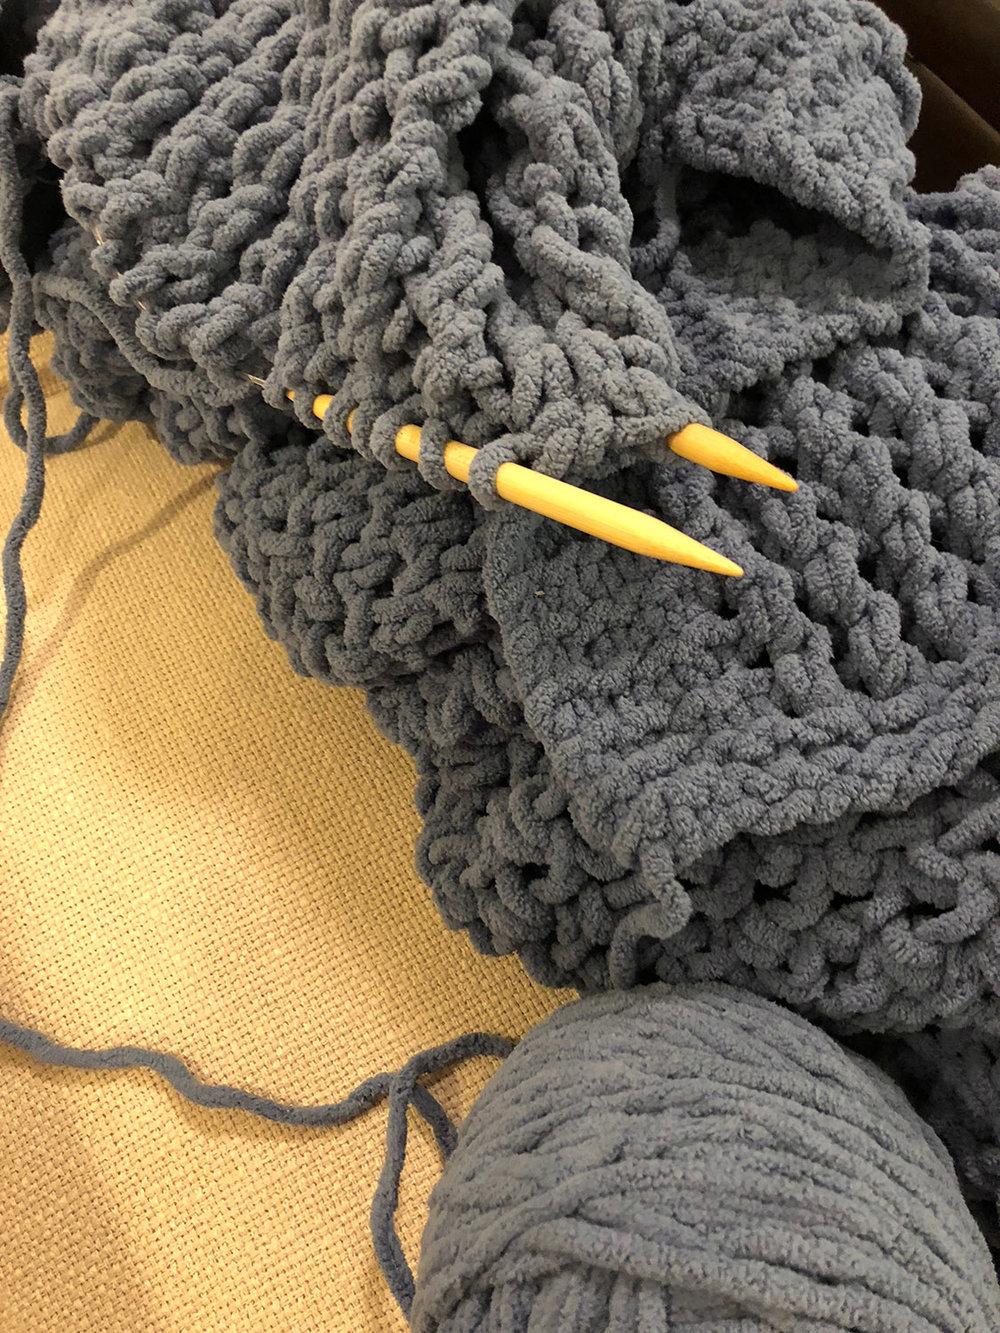 Hand knitting needles with chunky yarn throw